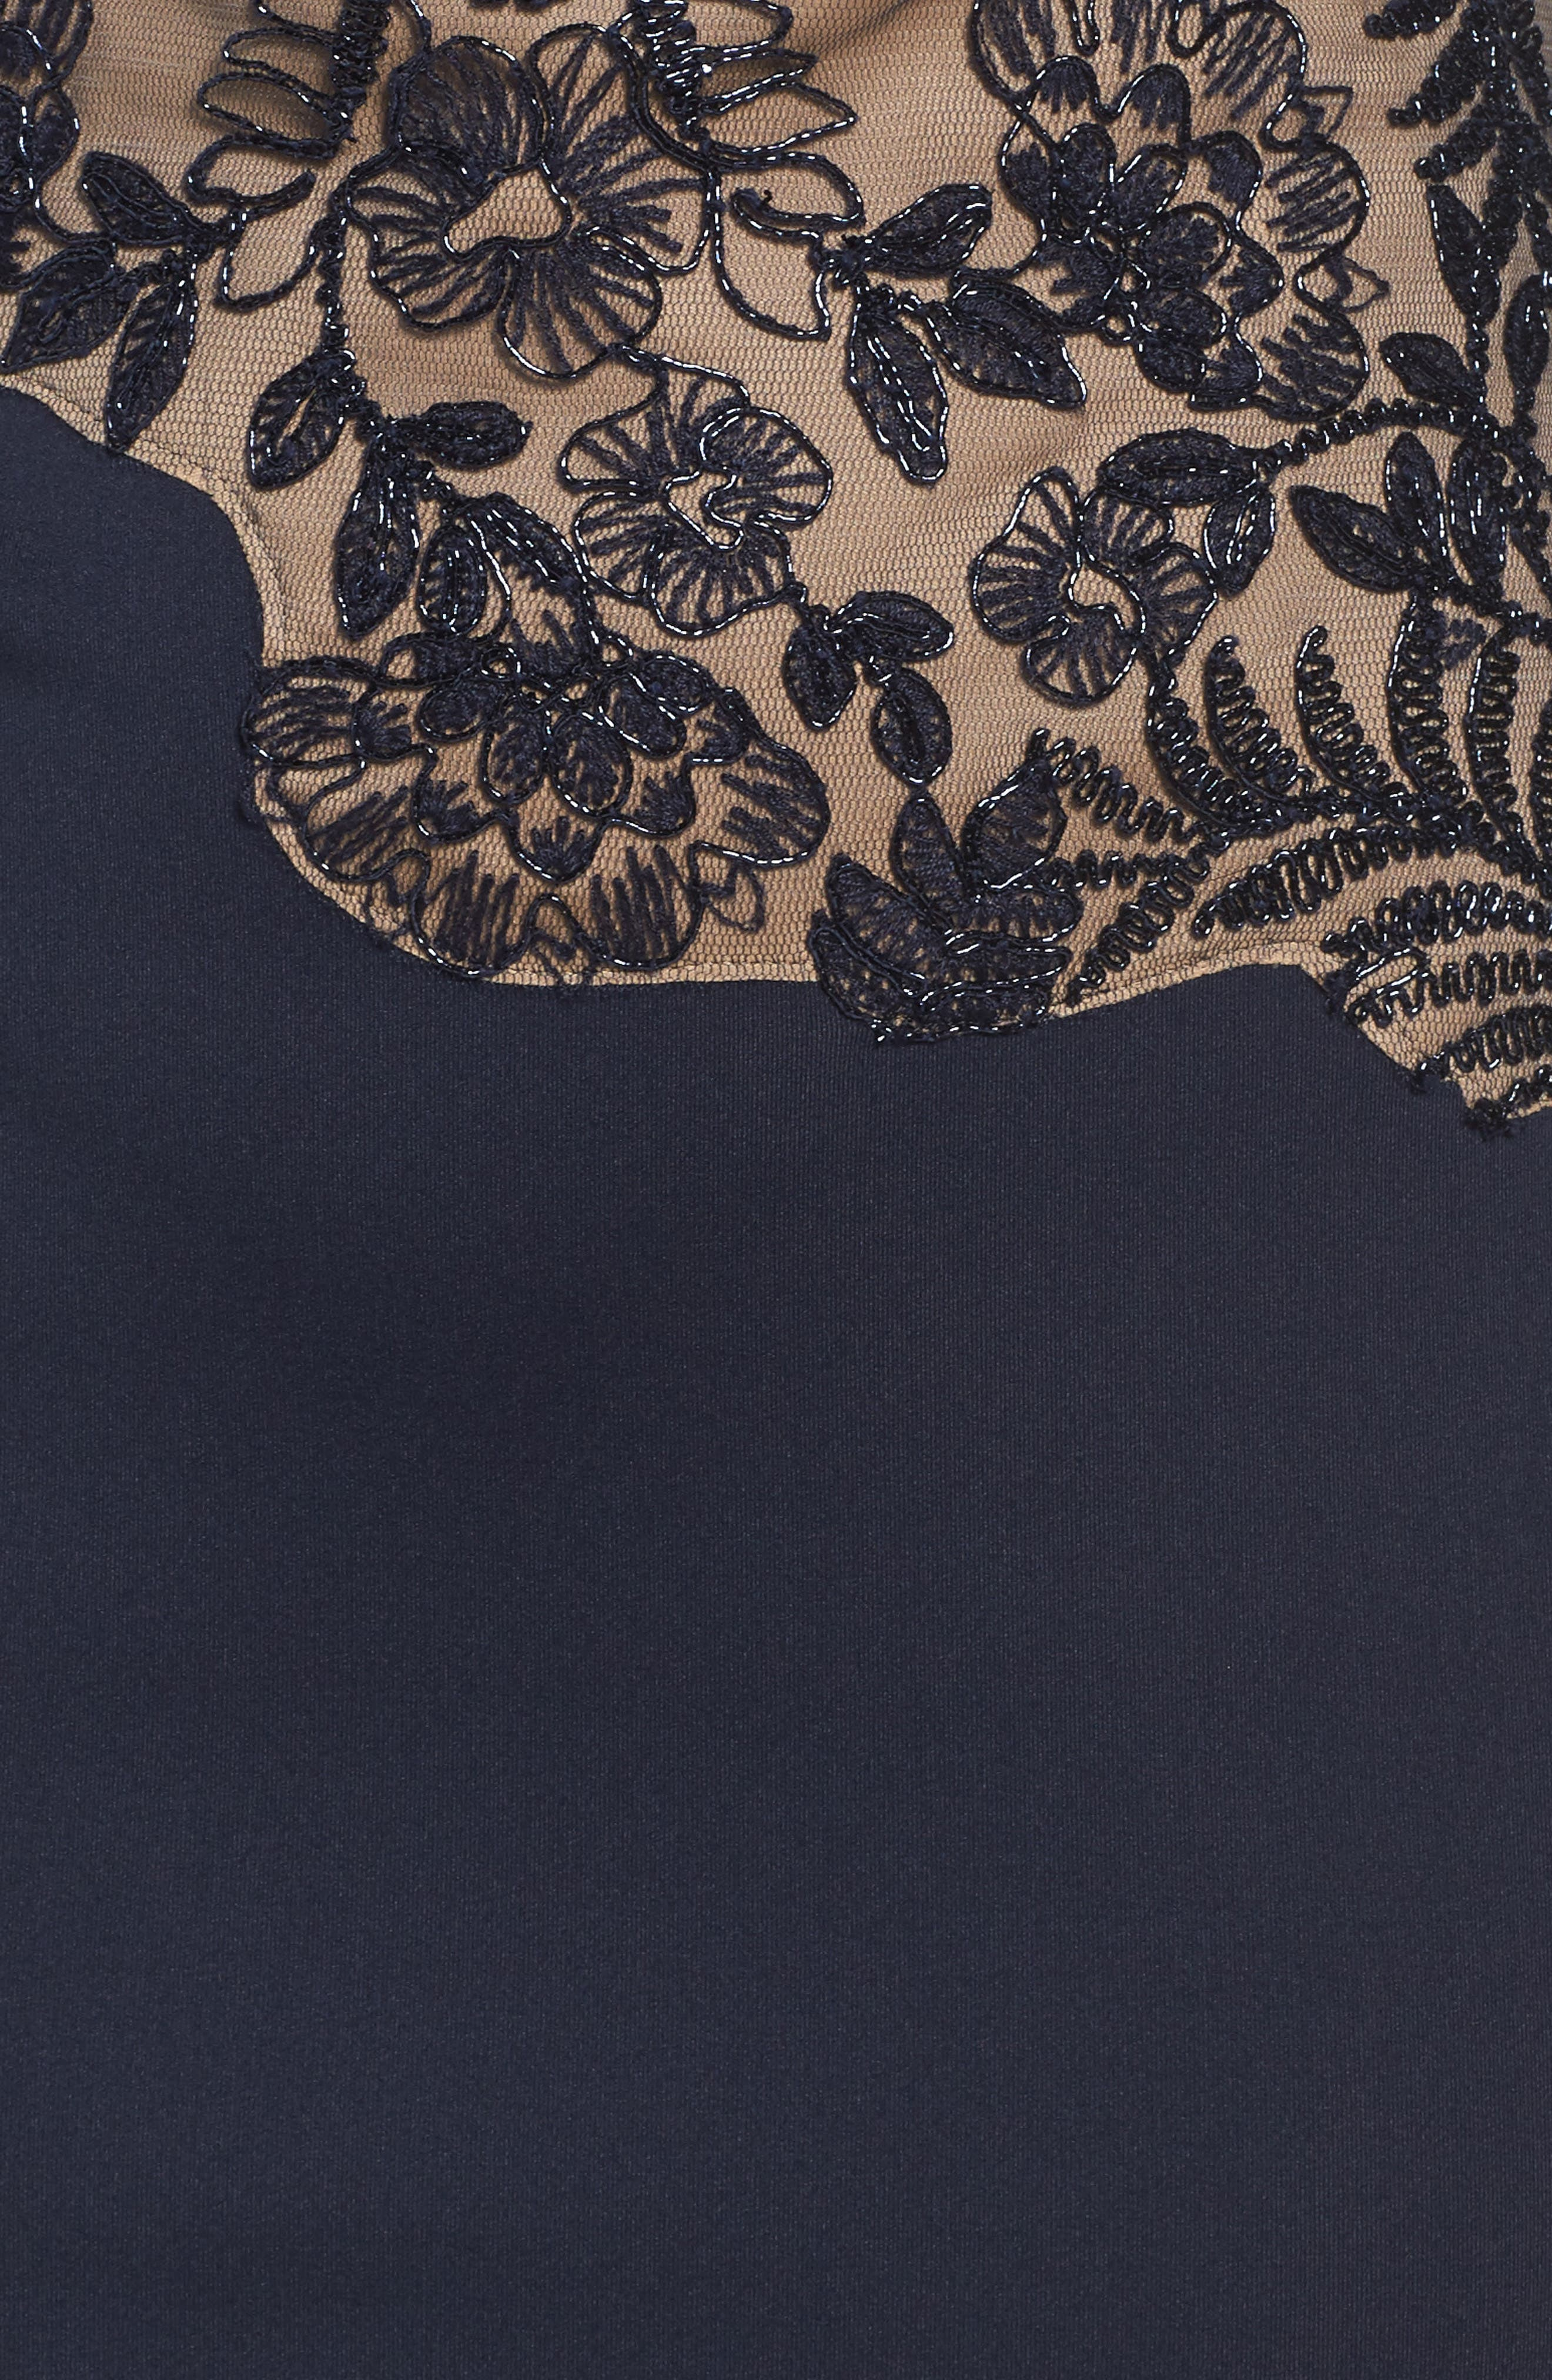 Lace Sheath Dress,                             Alternate thumbnail 5, color,                             Navy/ Nude